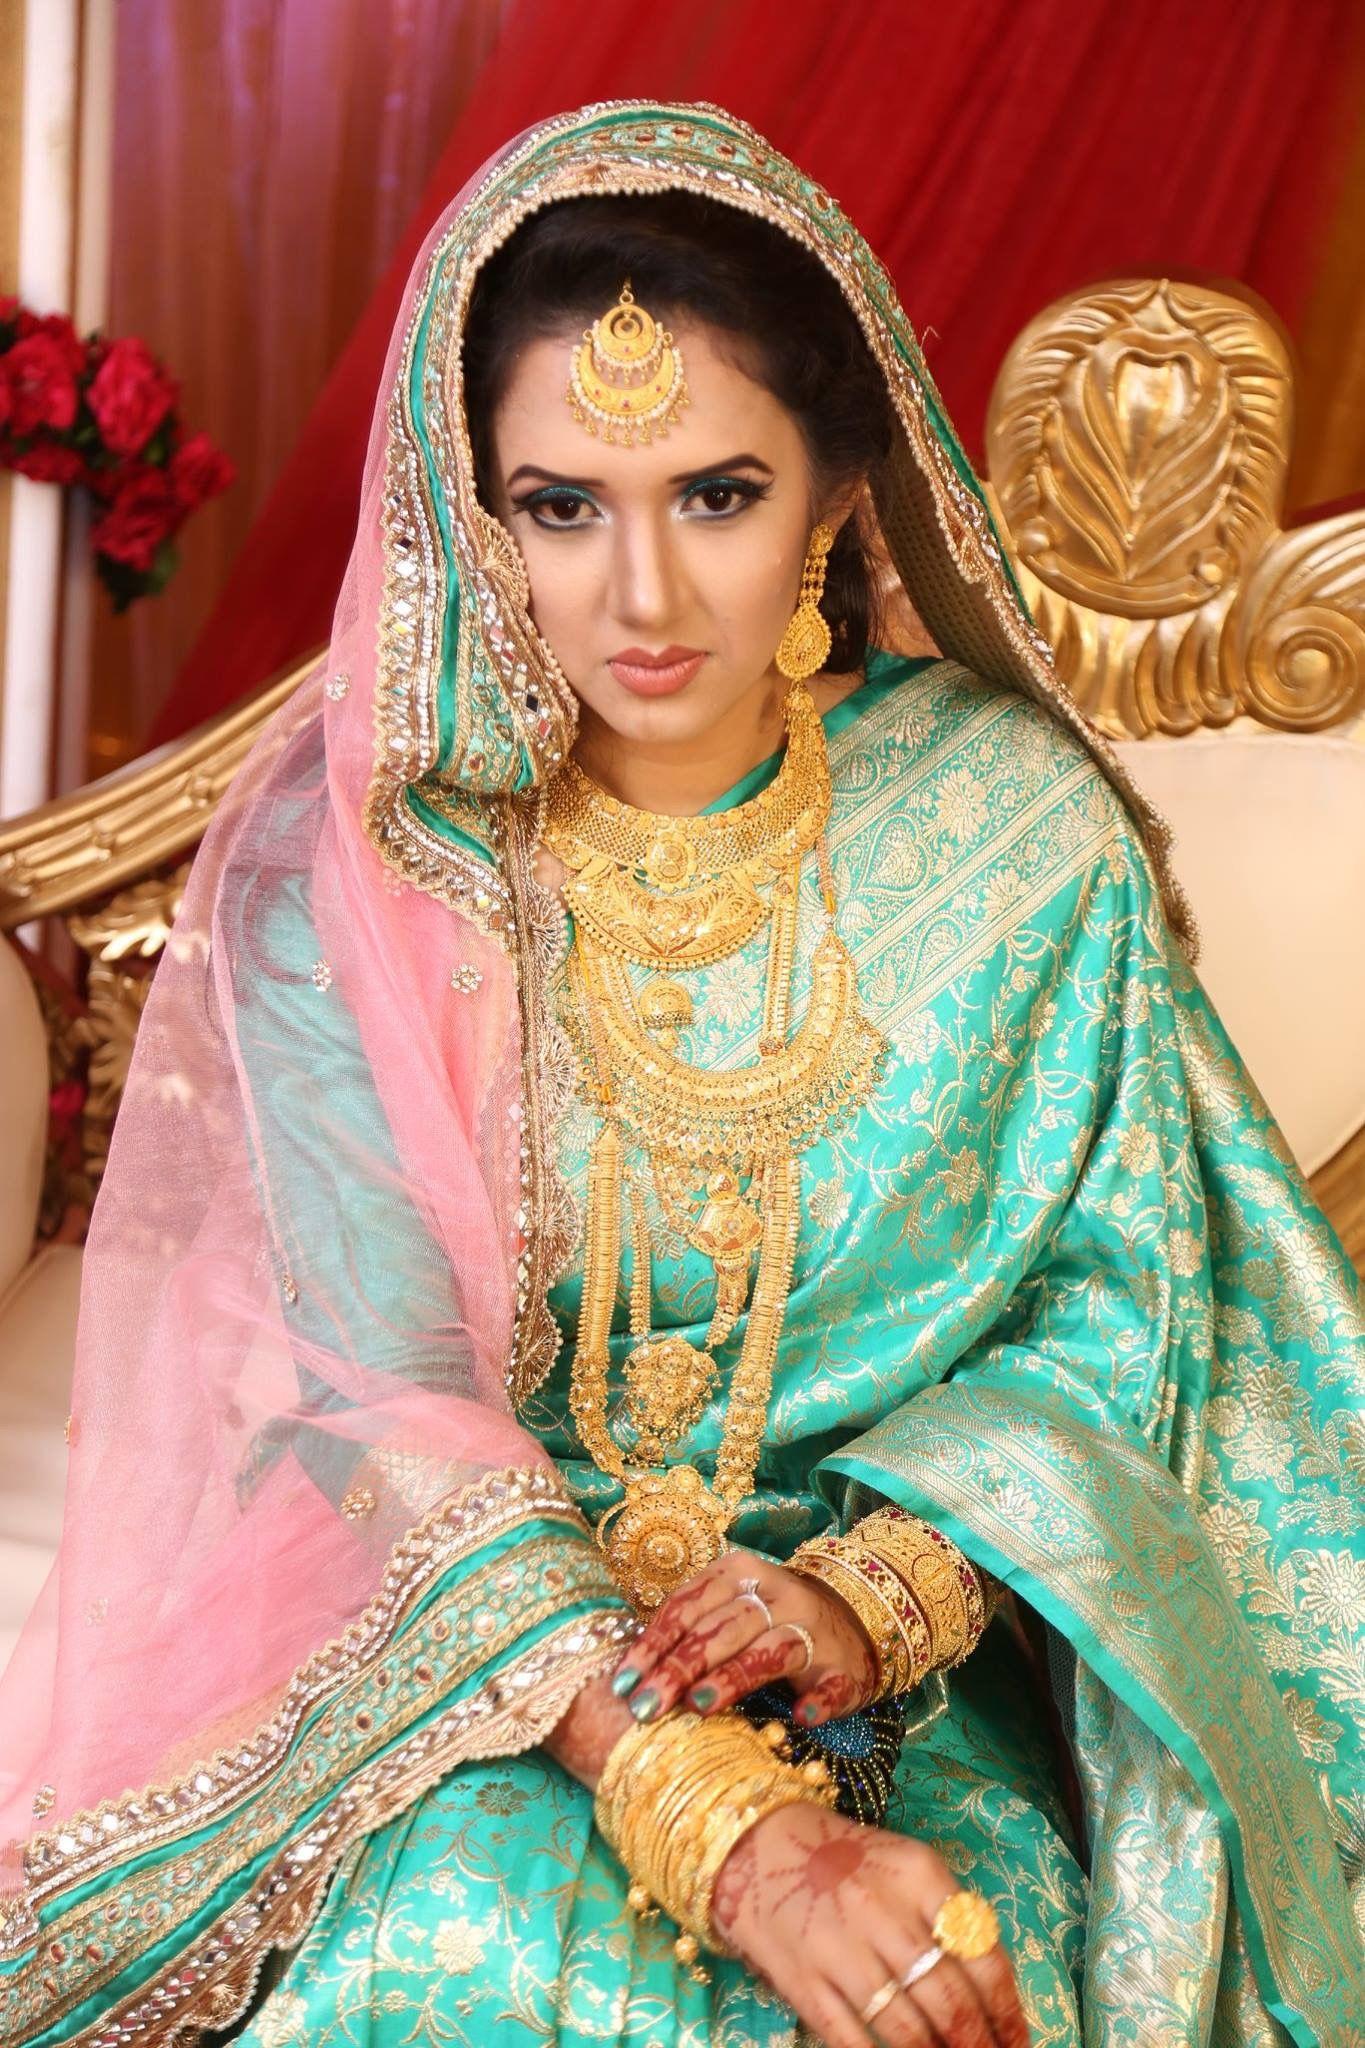 Bangladeshi Bride & Groom | Exotic Brides | Pinterest